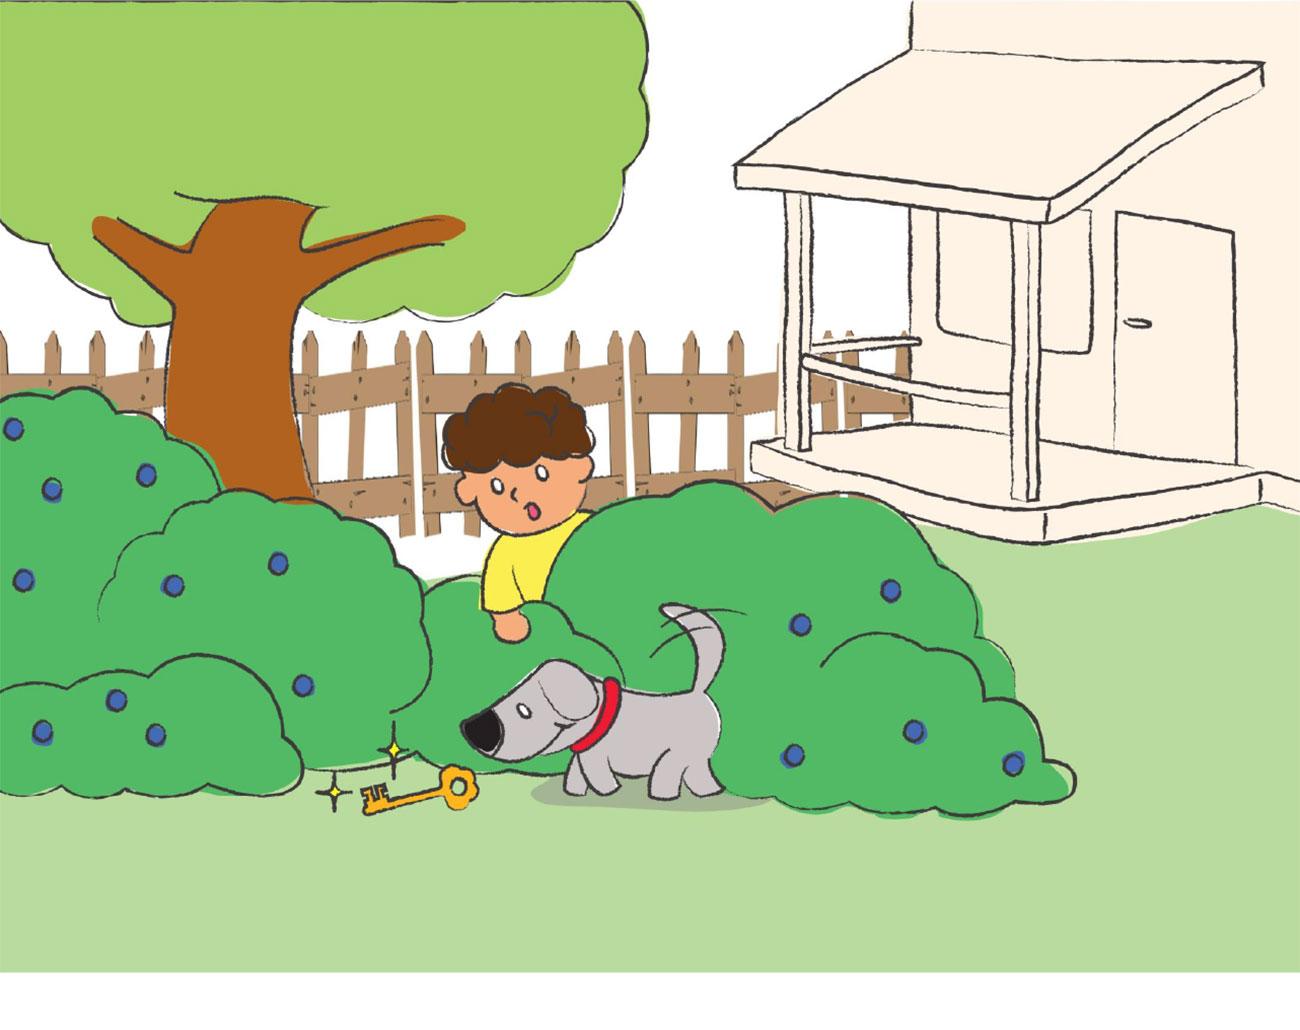 kids short story 'Down the memory lane with nash' by uma bala devarakonda - page 3